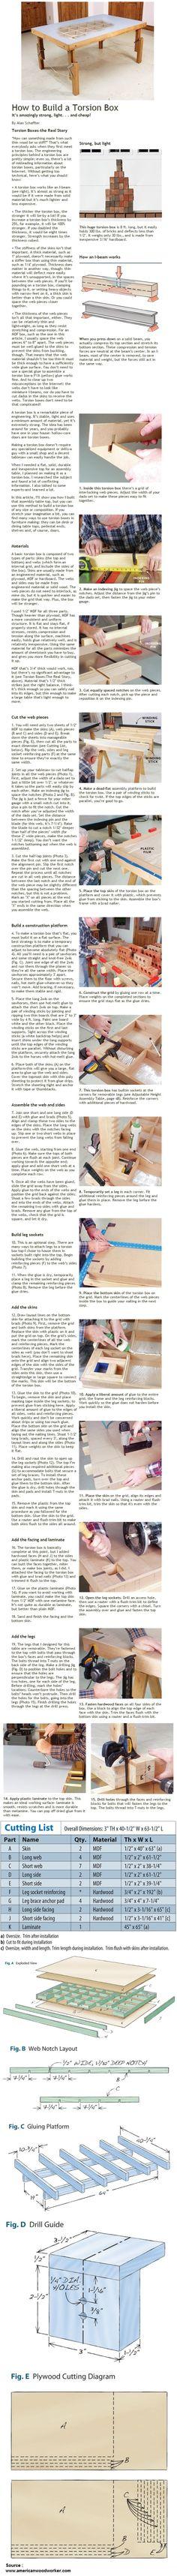 How to Build a Torsion Box | WoodworkerZ.com